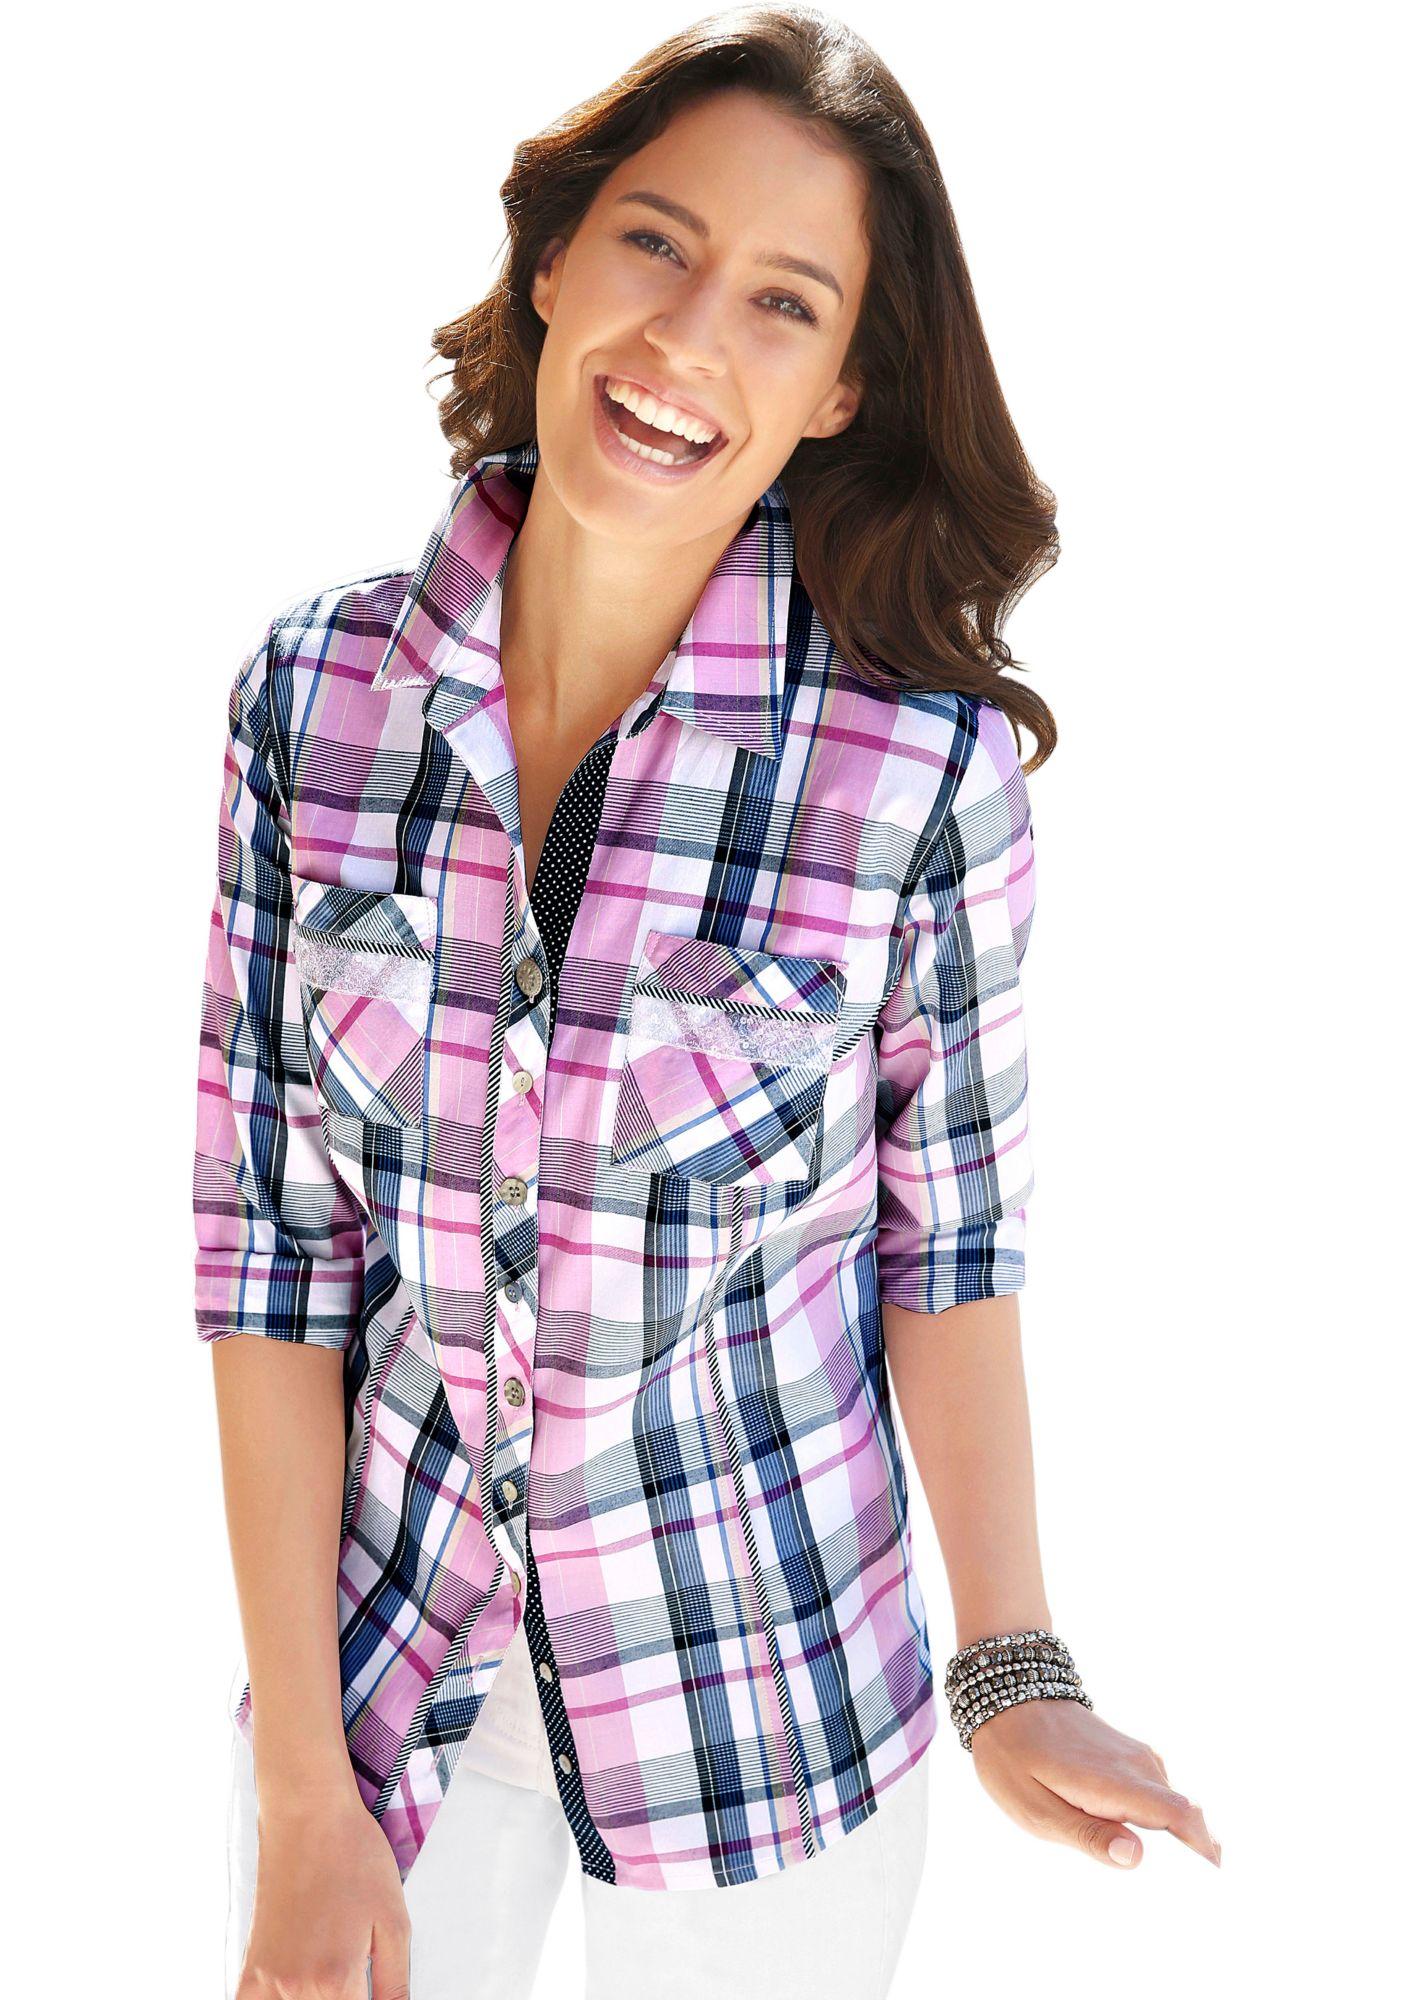 CLASSIC INSPIRATIONEN Classic Inspirationen Bluse mit Streifenpaspeln